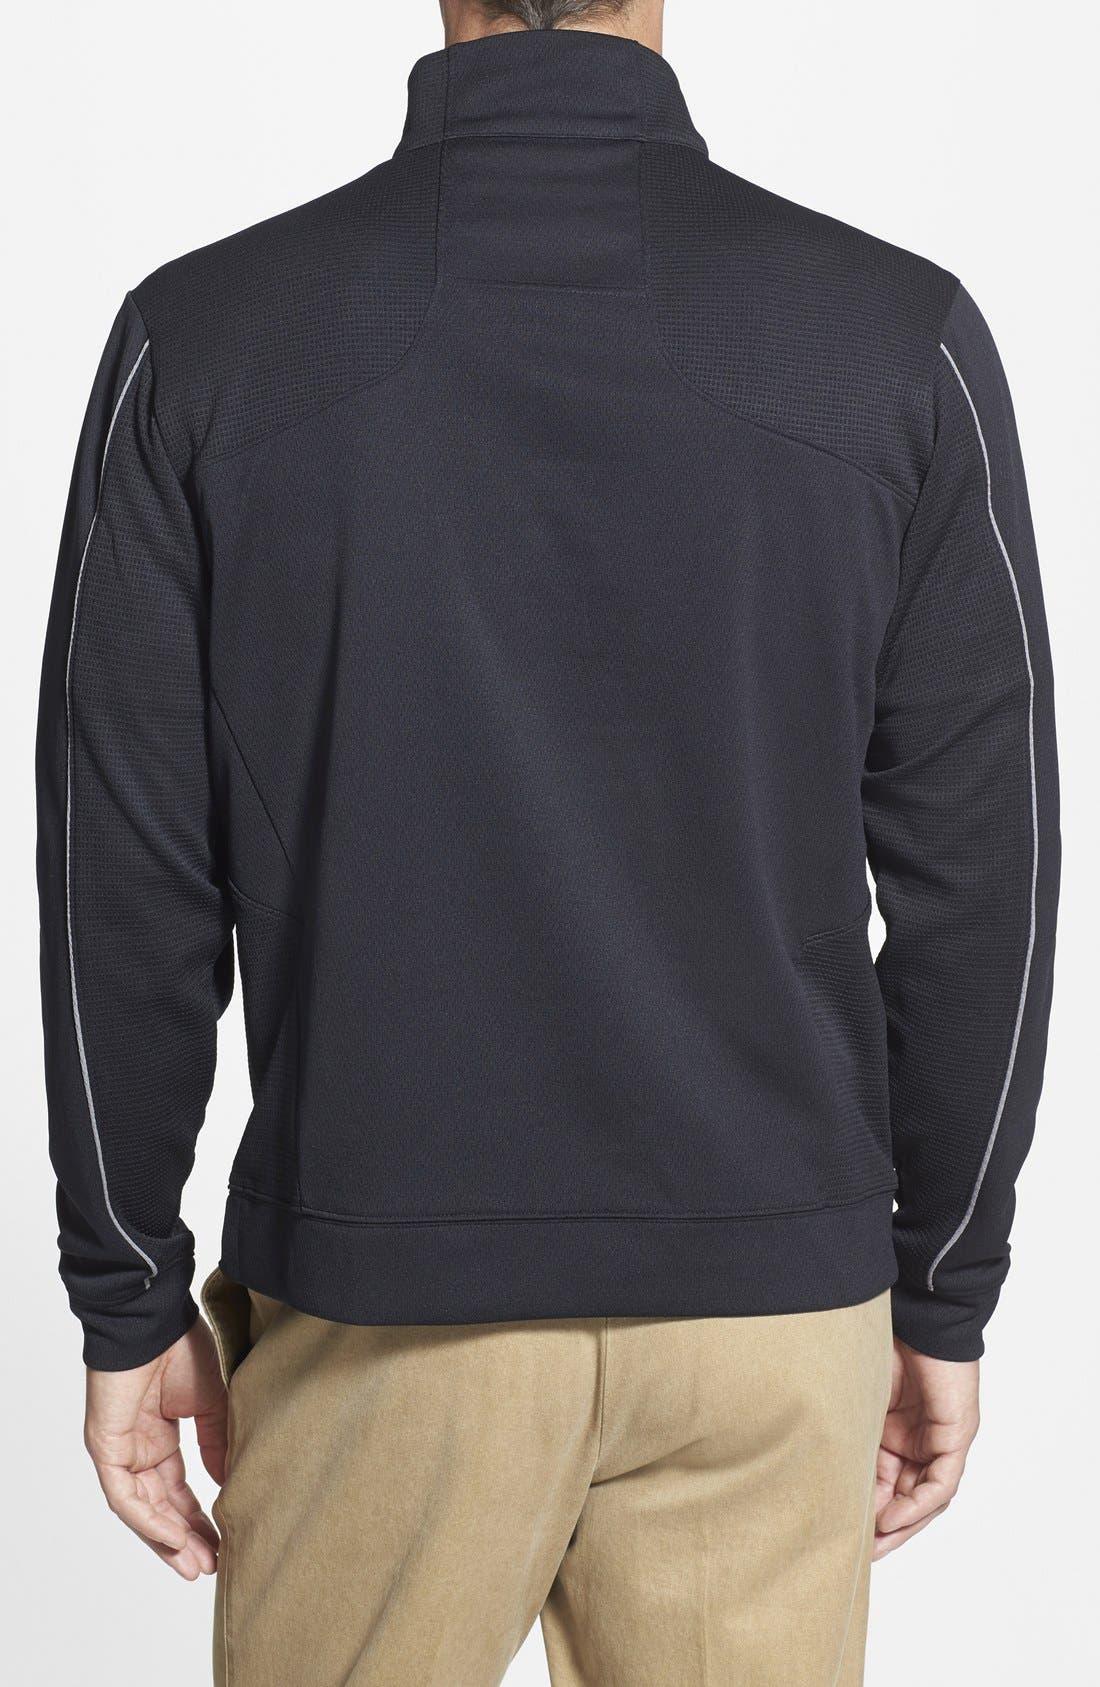 Oakland Raiders - Edge DryTec Moisture Wicking Half Zip Pullover,                             Alternate thumbnail 2, color,                             001